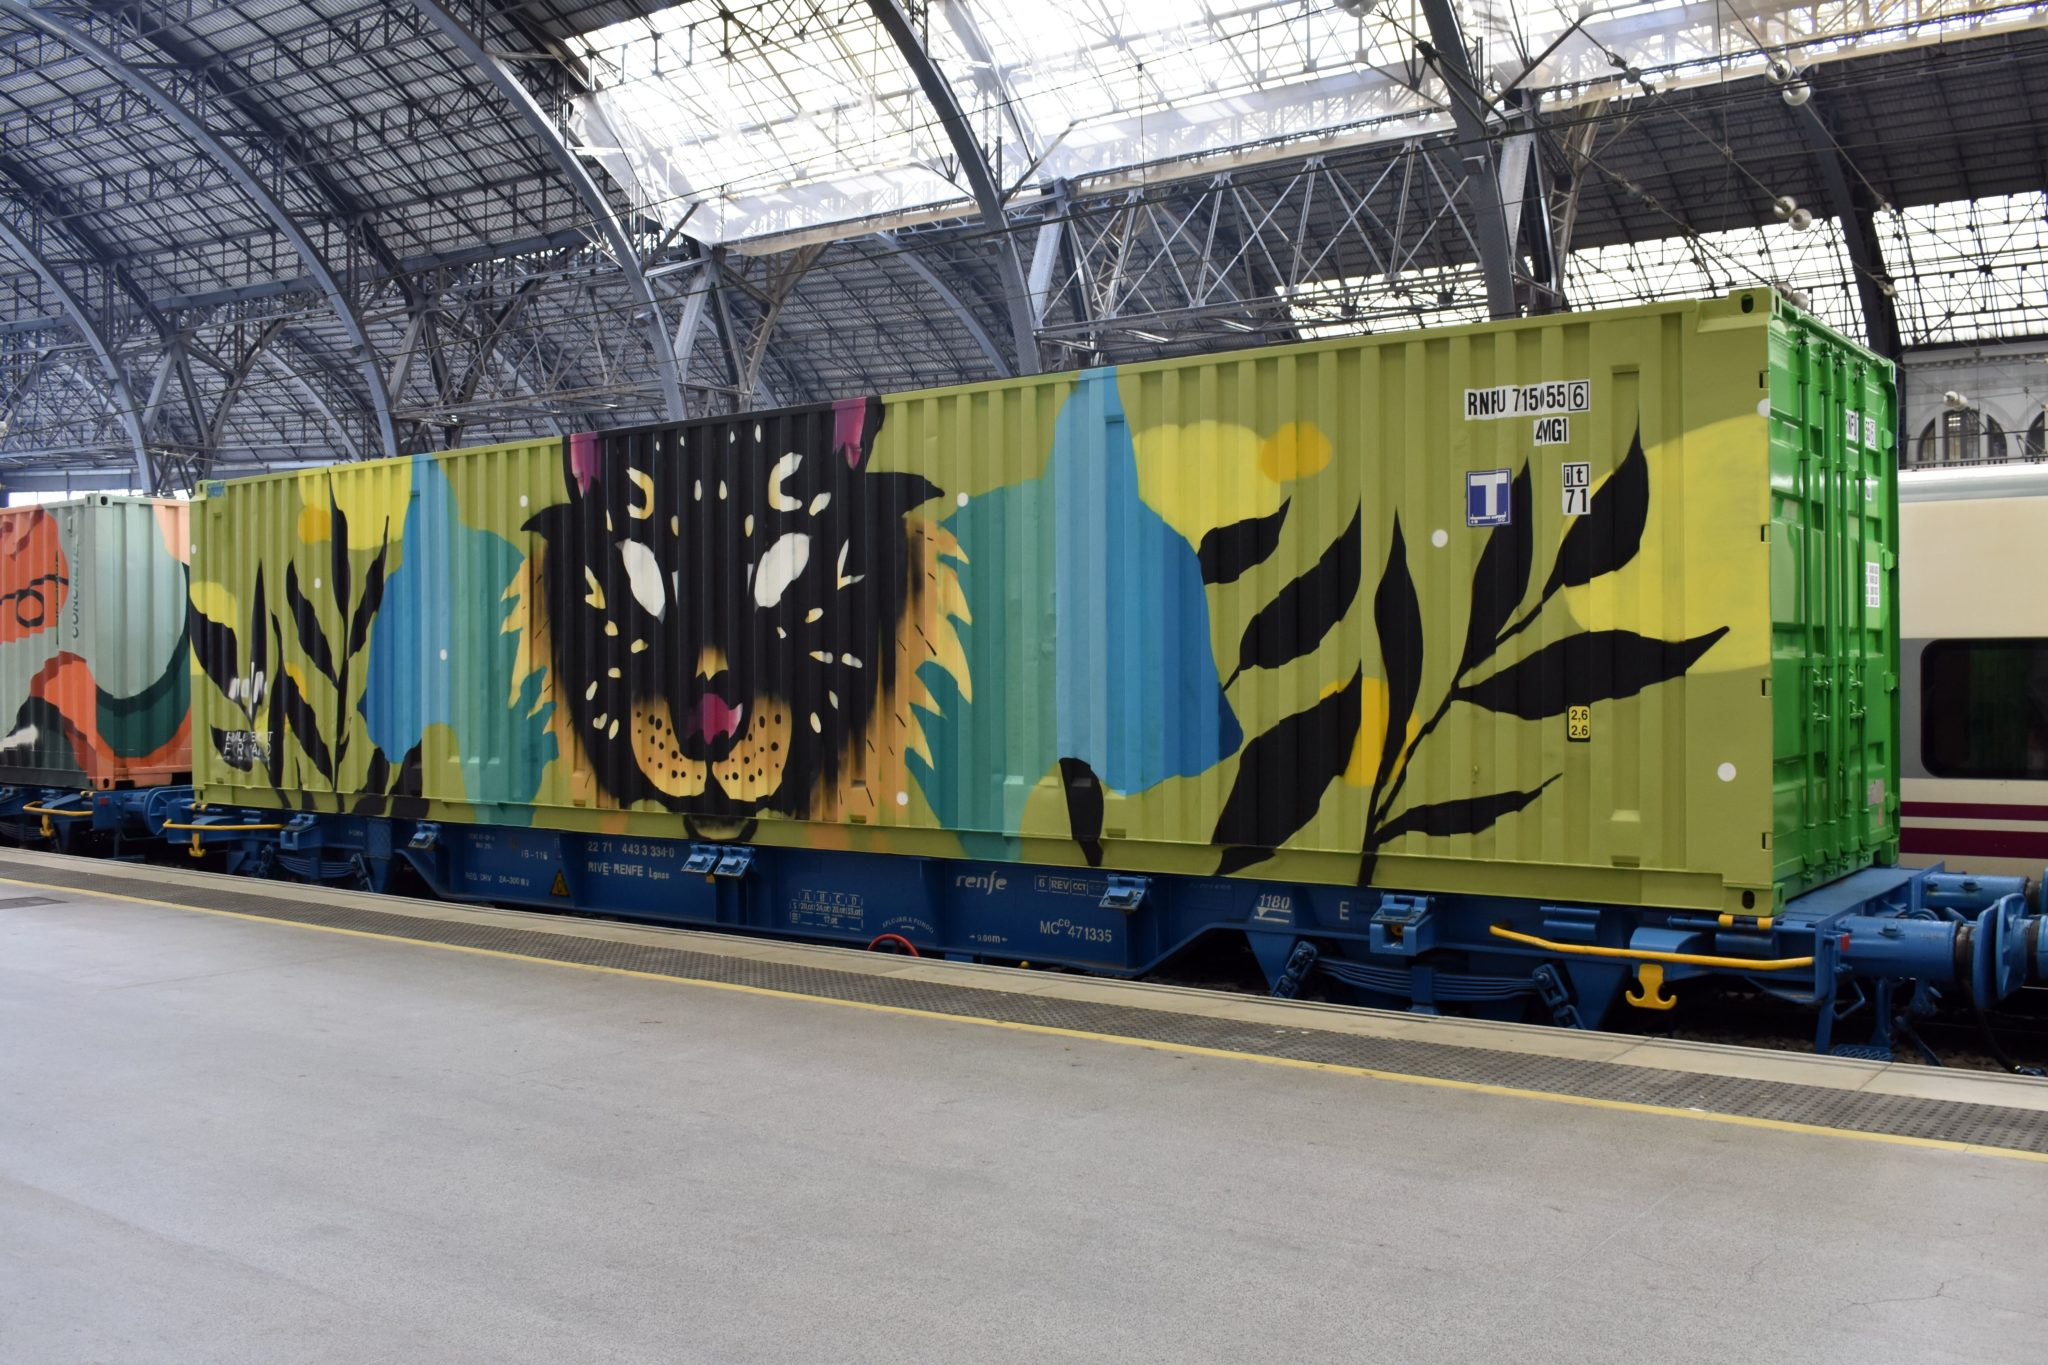 Sabek Noah's train street art